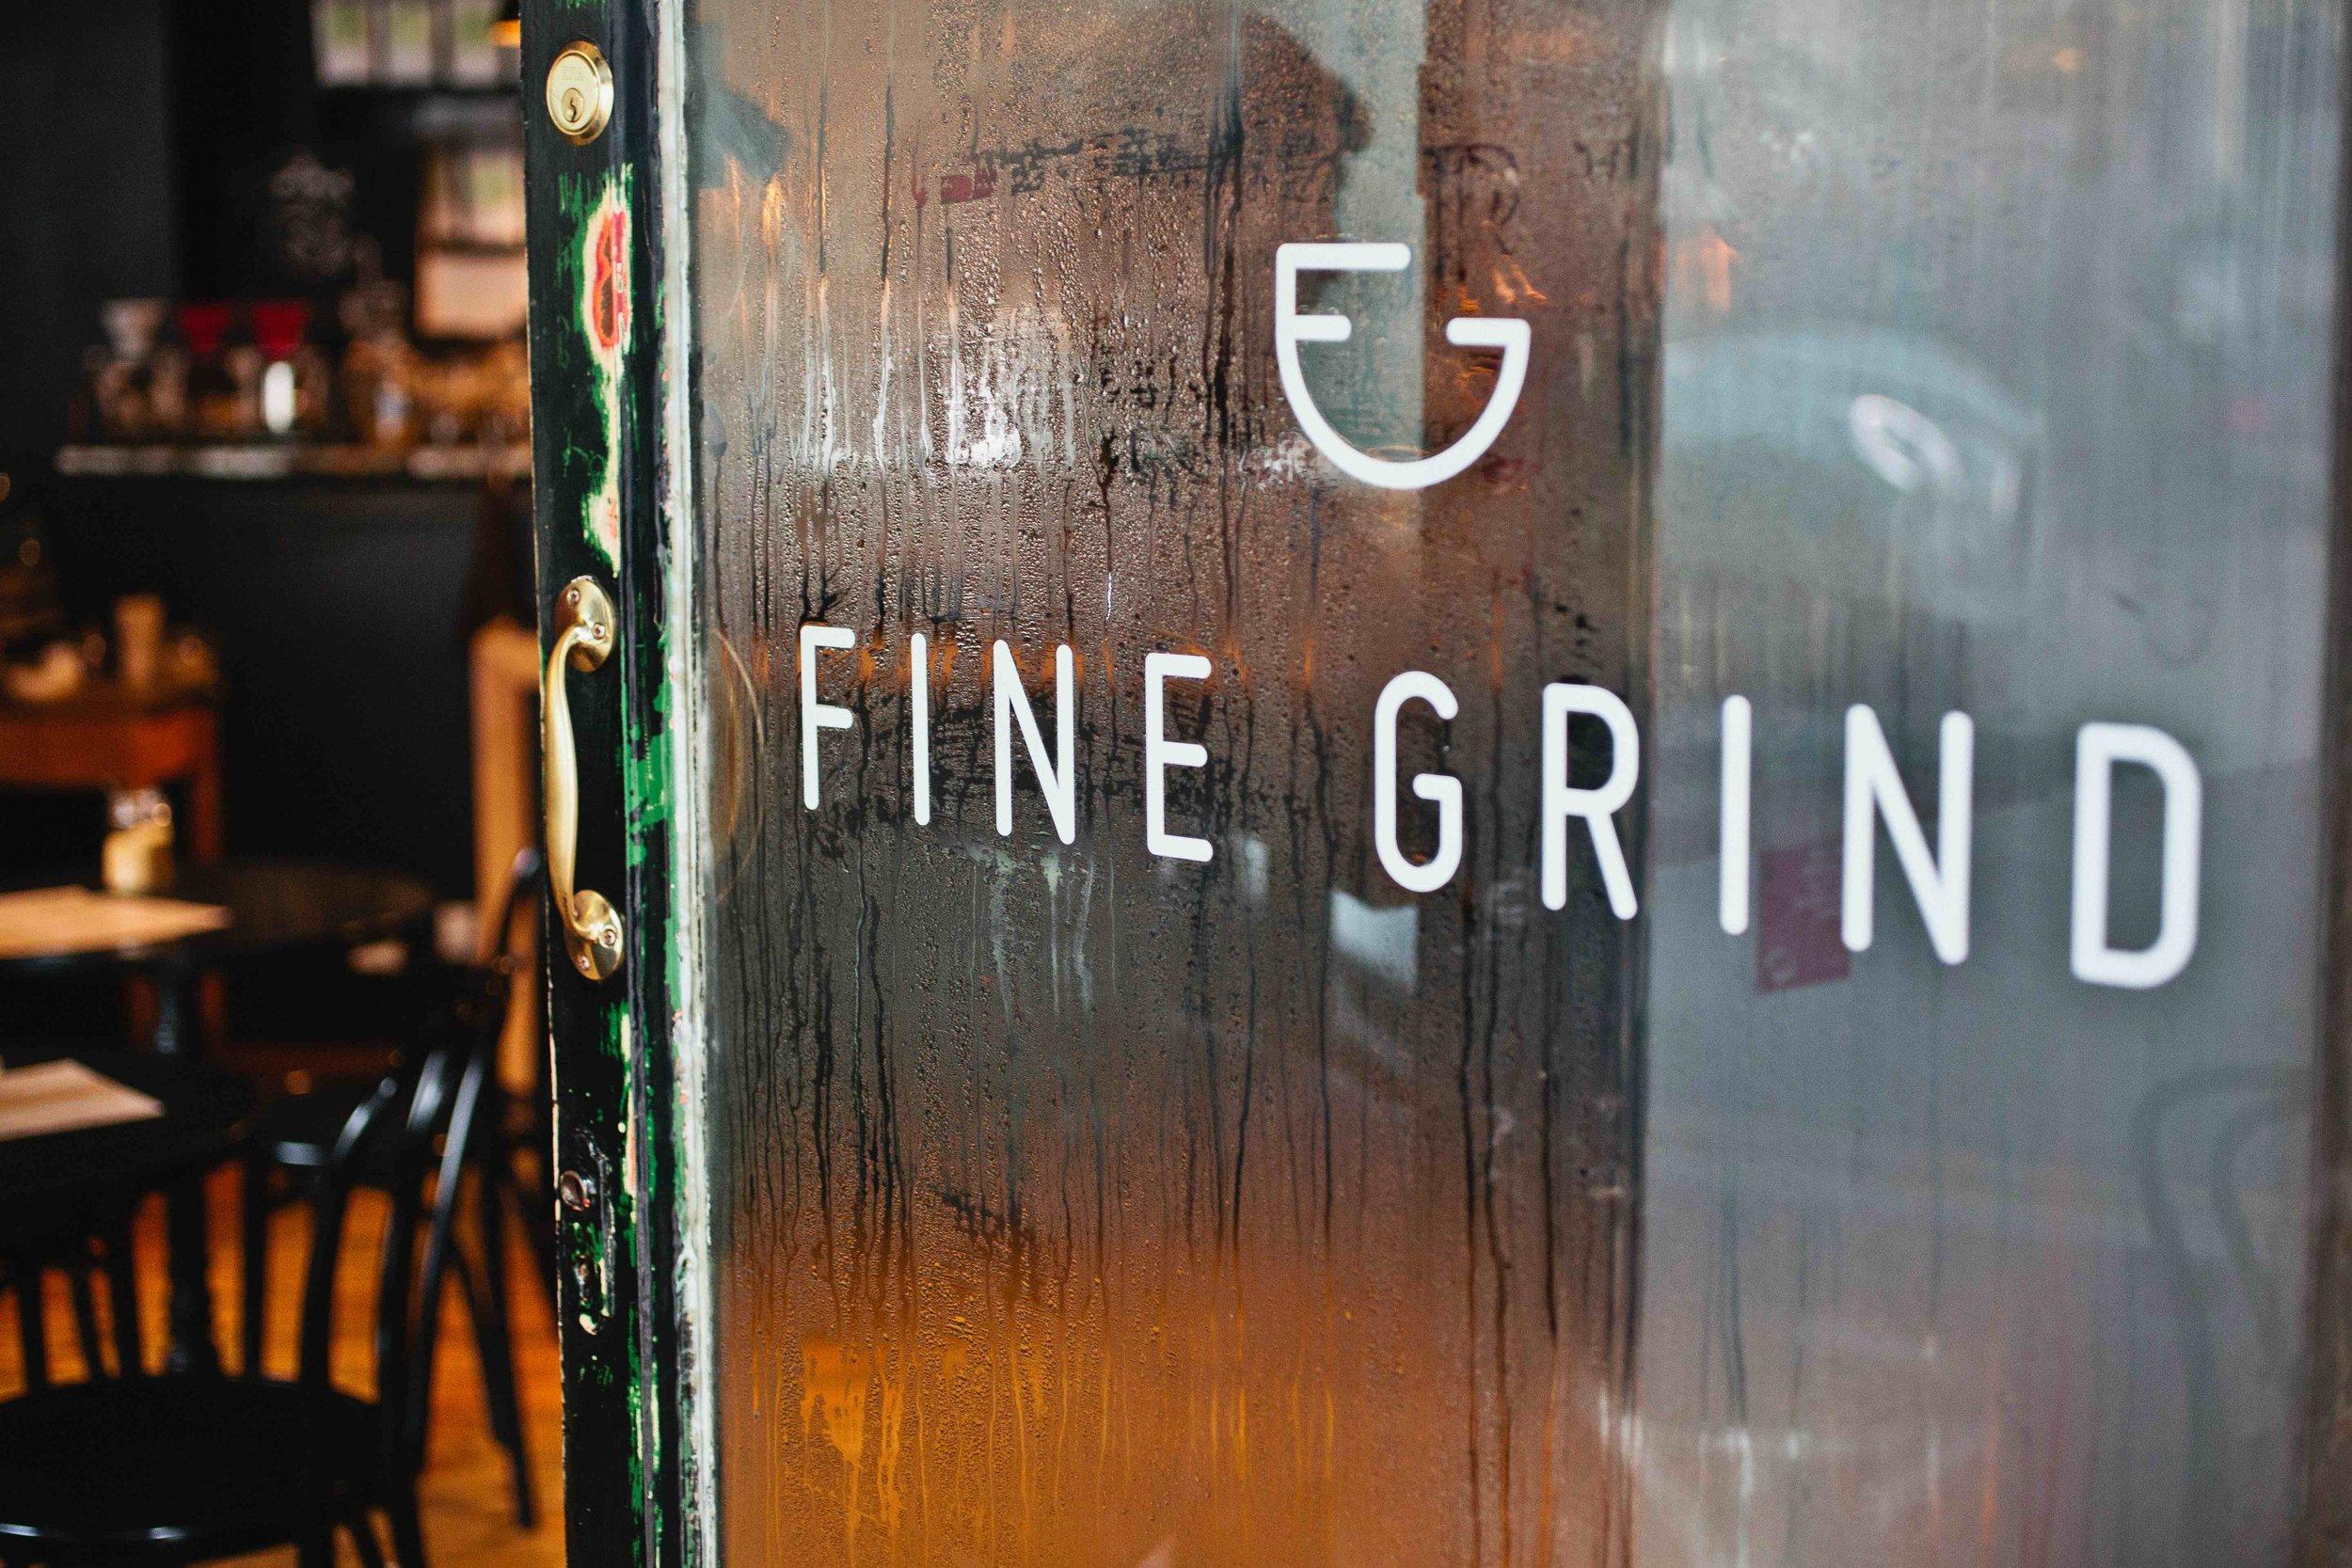 Fine Grind coffee shop, Tunbridge Wells, window display